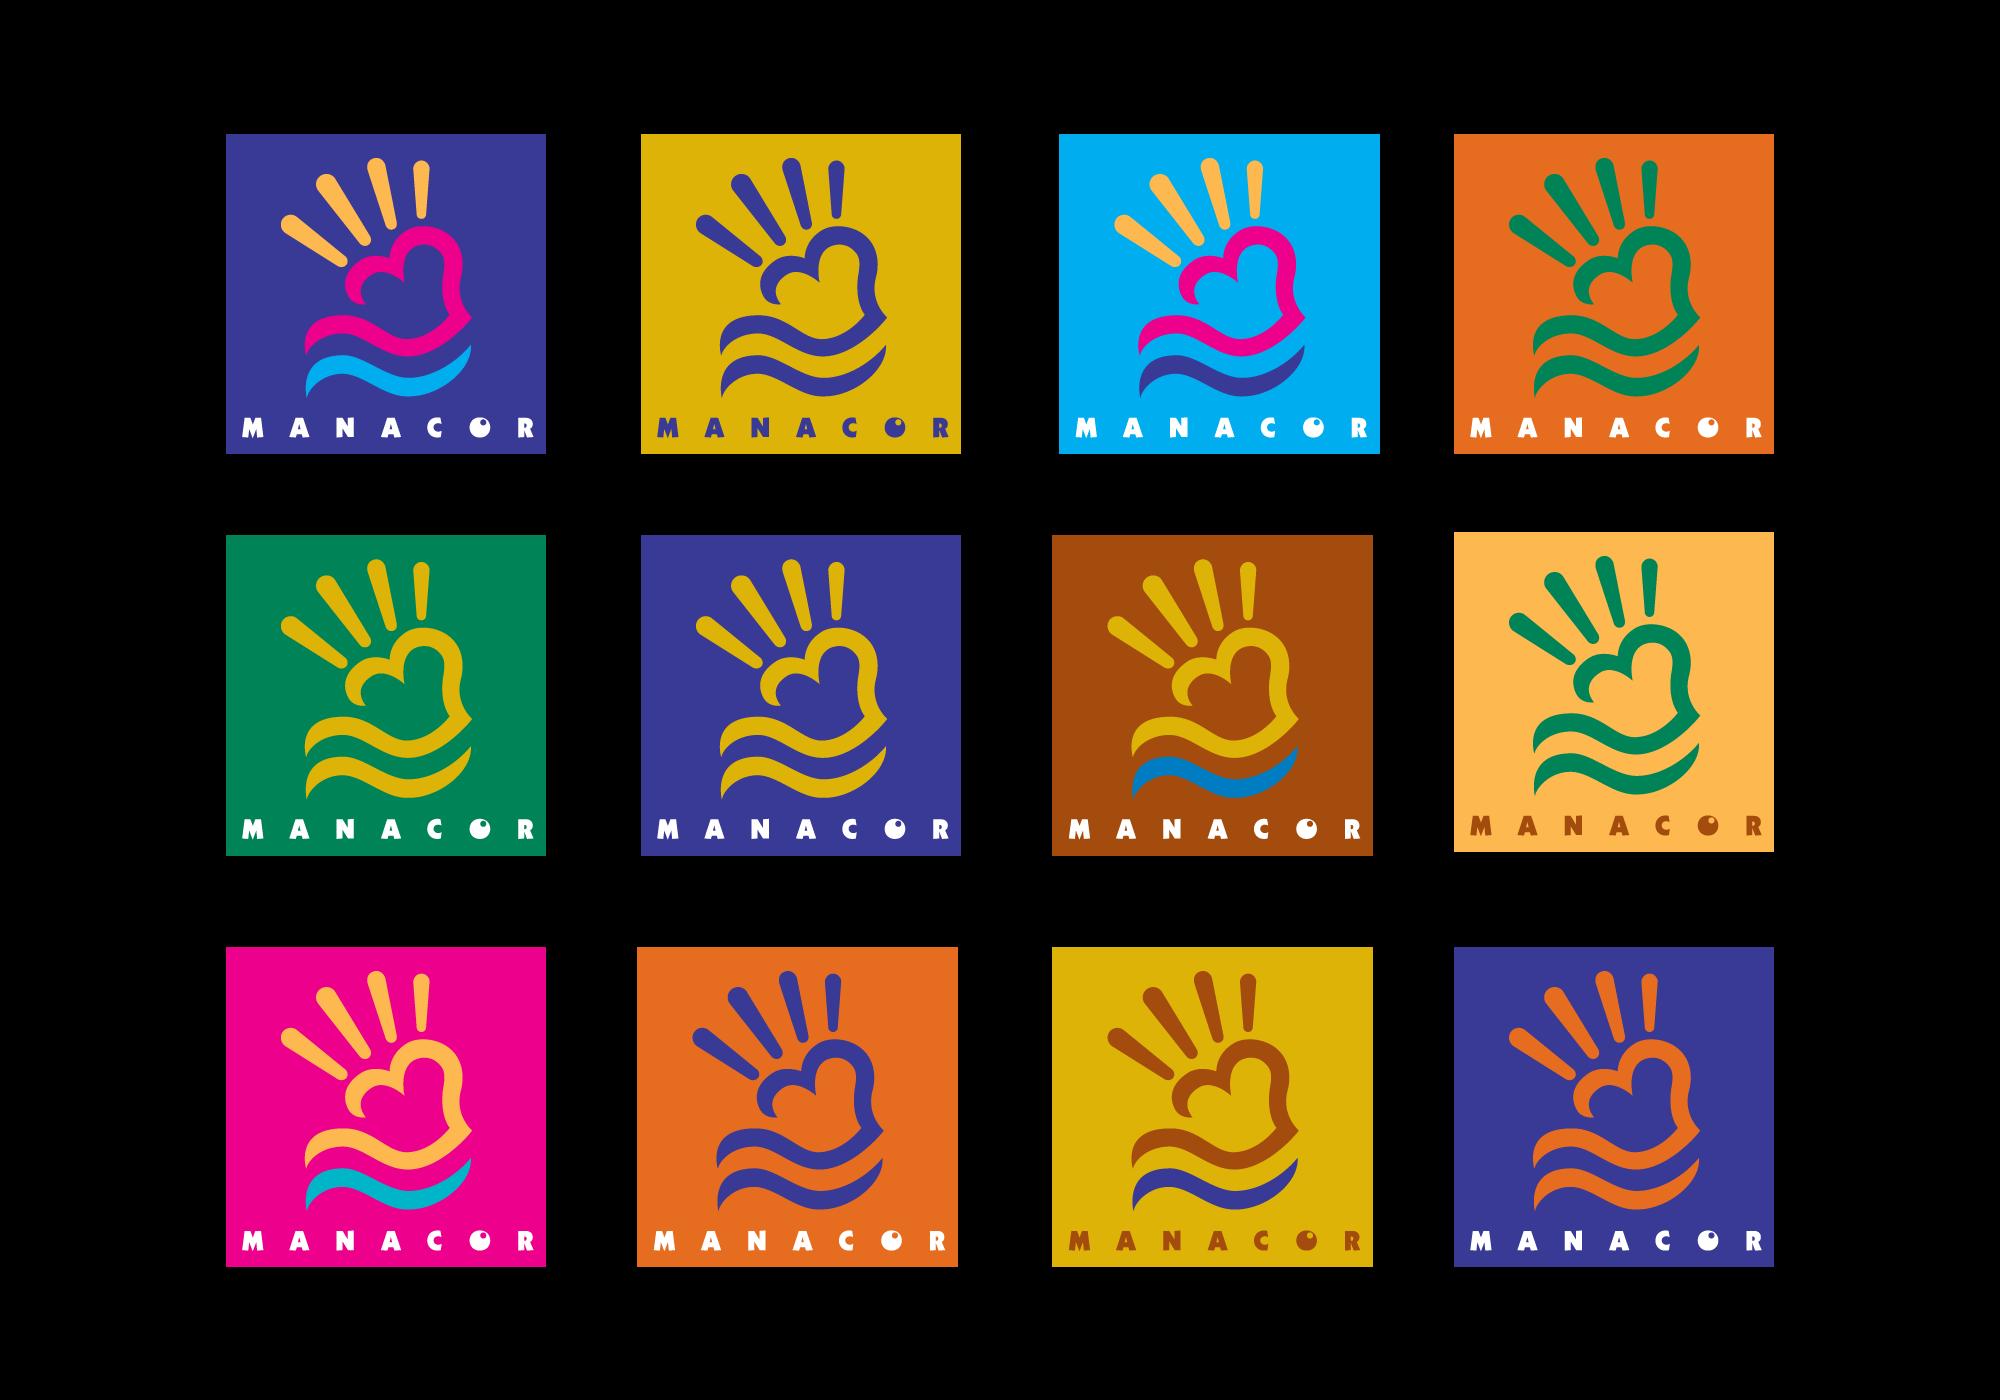 manacor-logo-variations